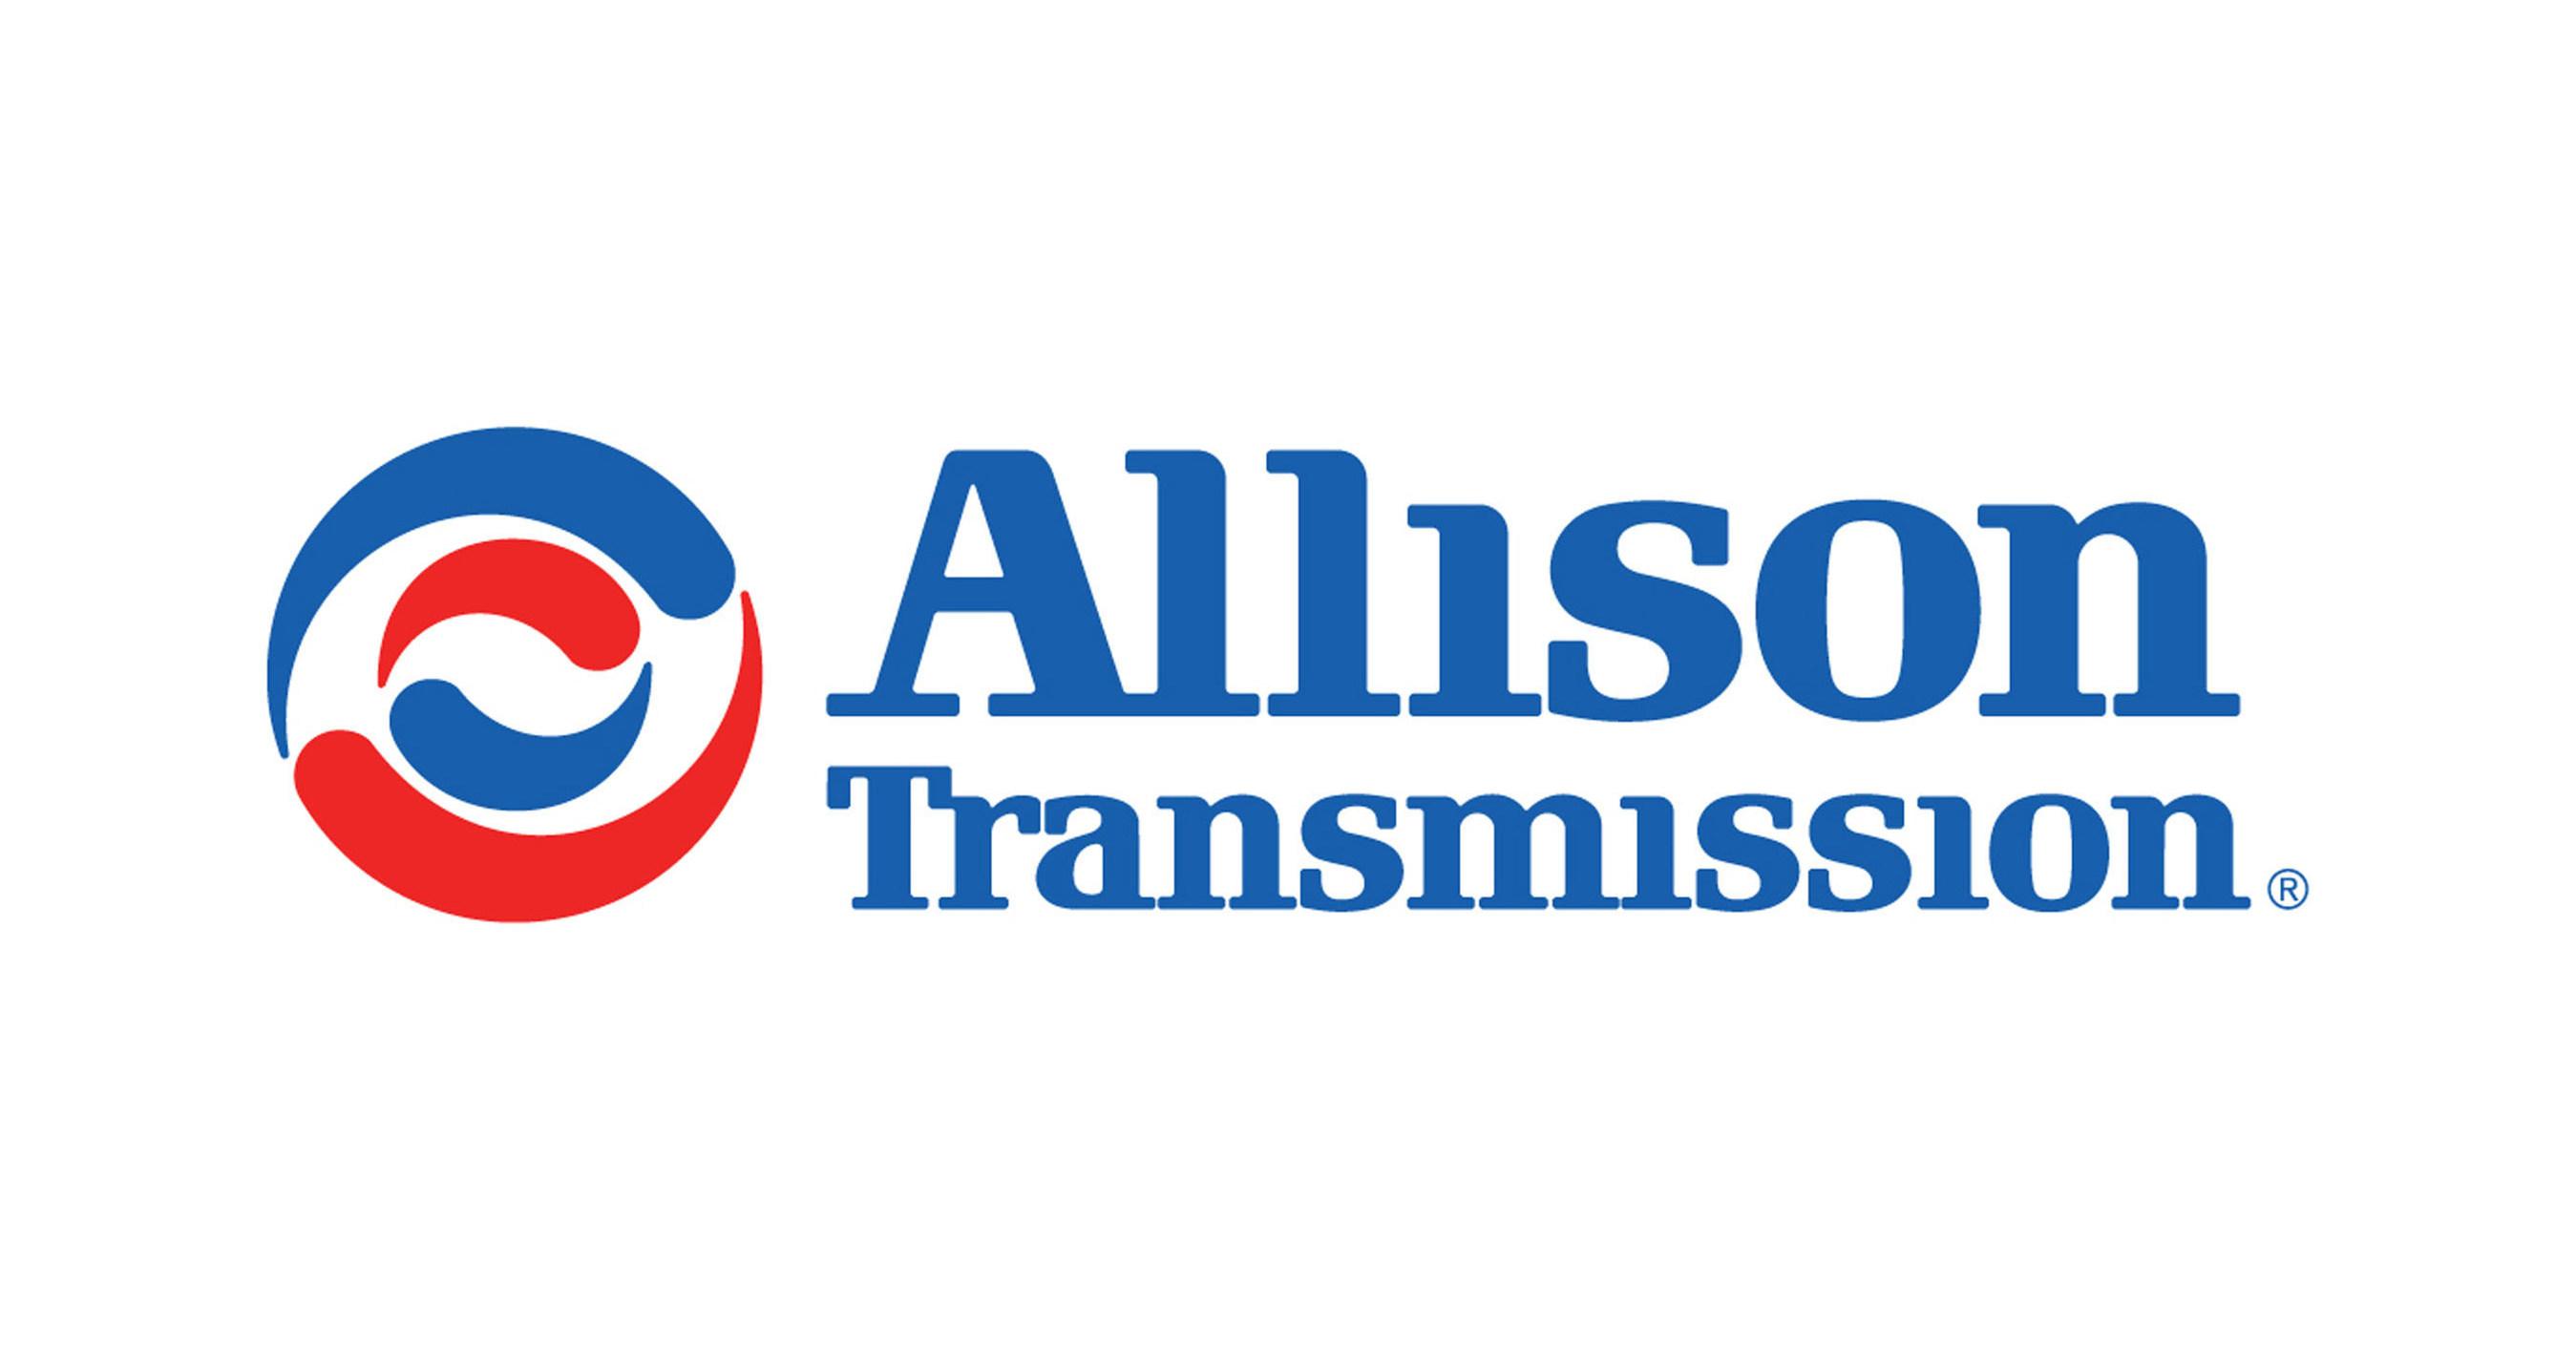 Allison Transmission introduces next generation of advanced